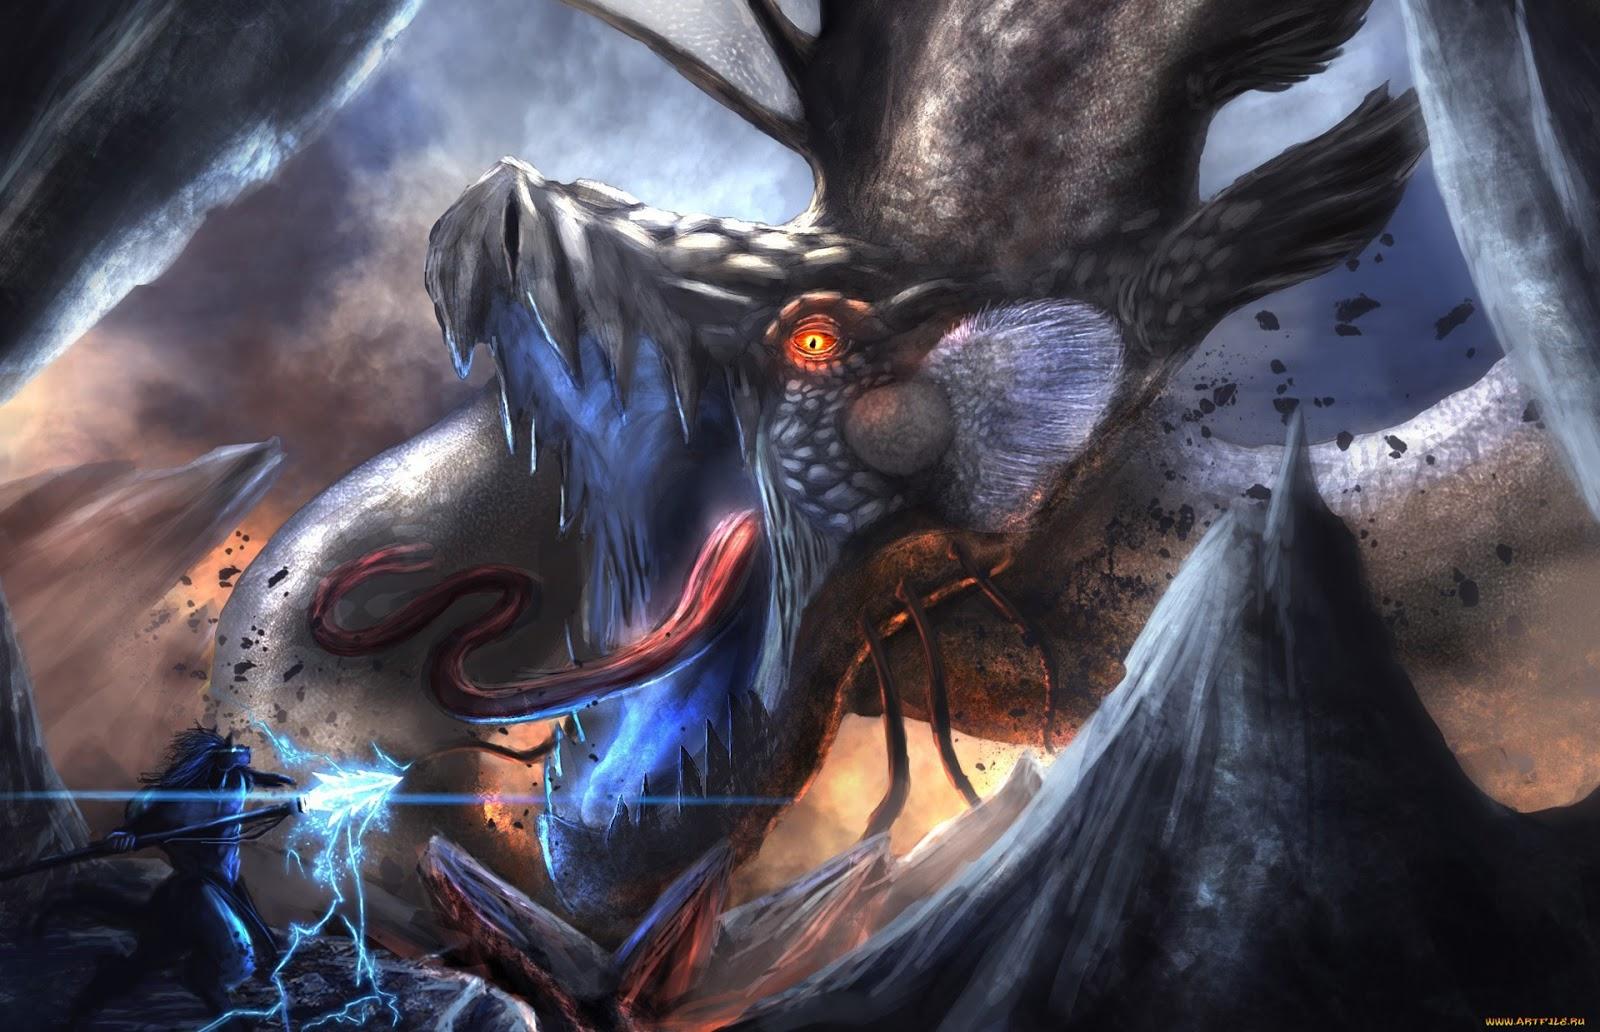 Epic Fantasy Warrior Dragon Monster Beast Anime HD Wallpaper Desktop 1600x1032